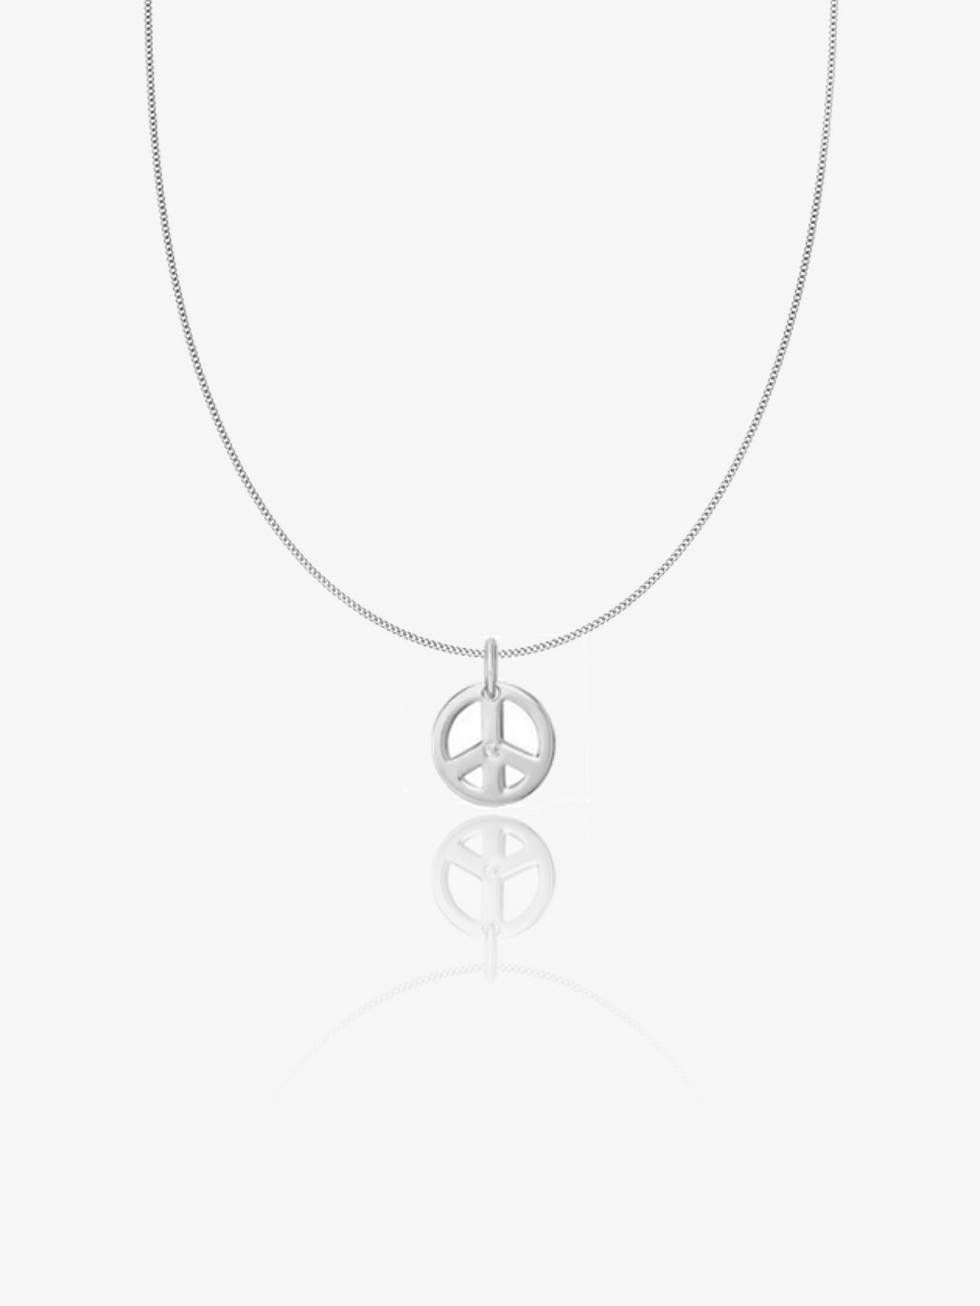 Collar peace cz  plata2